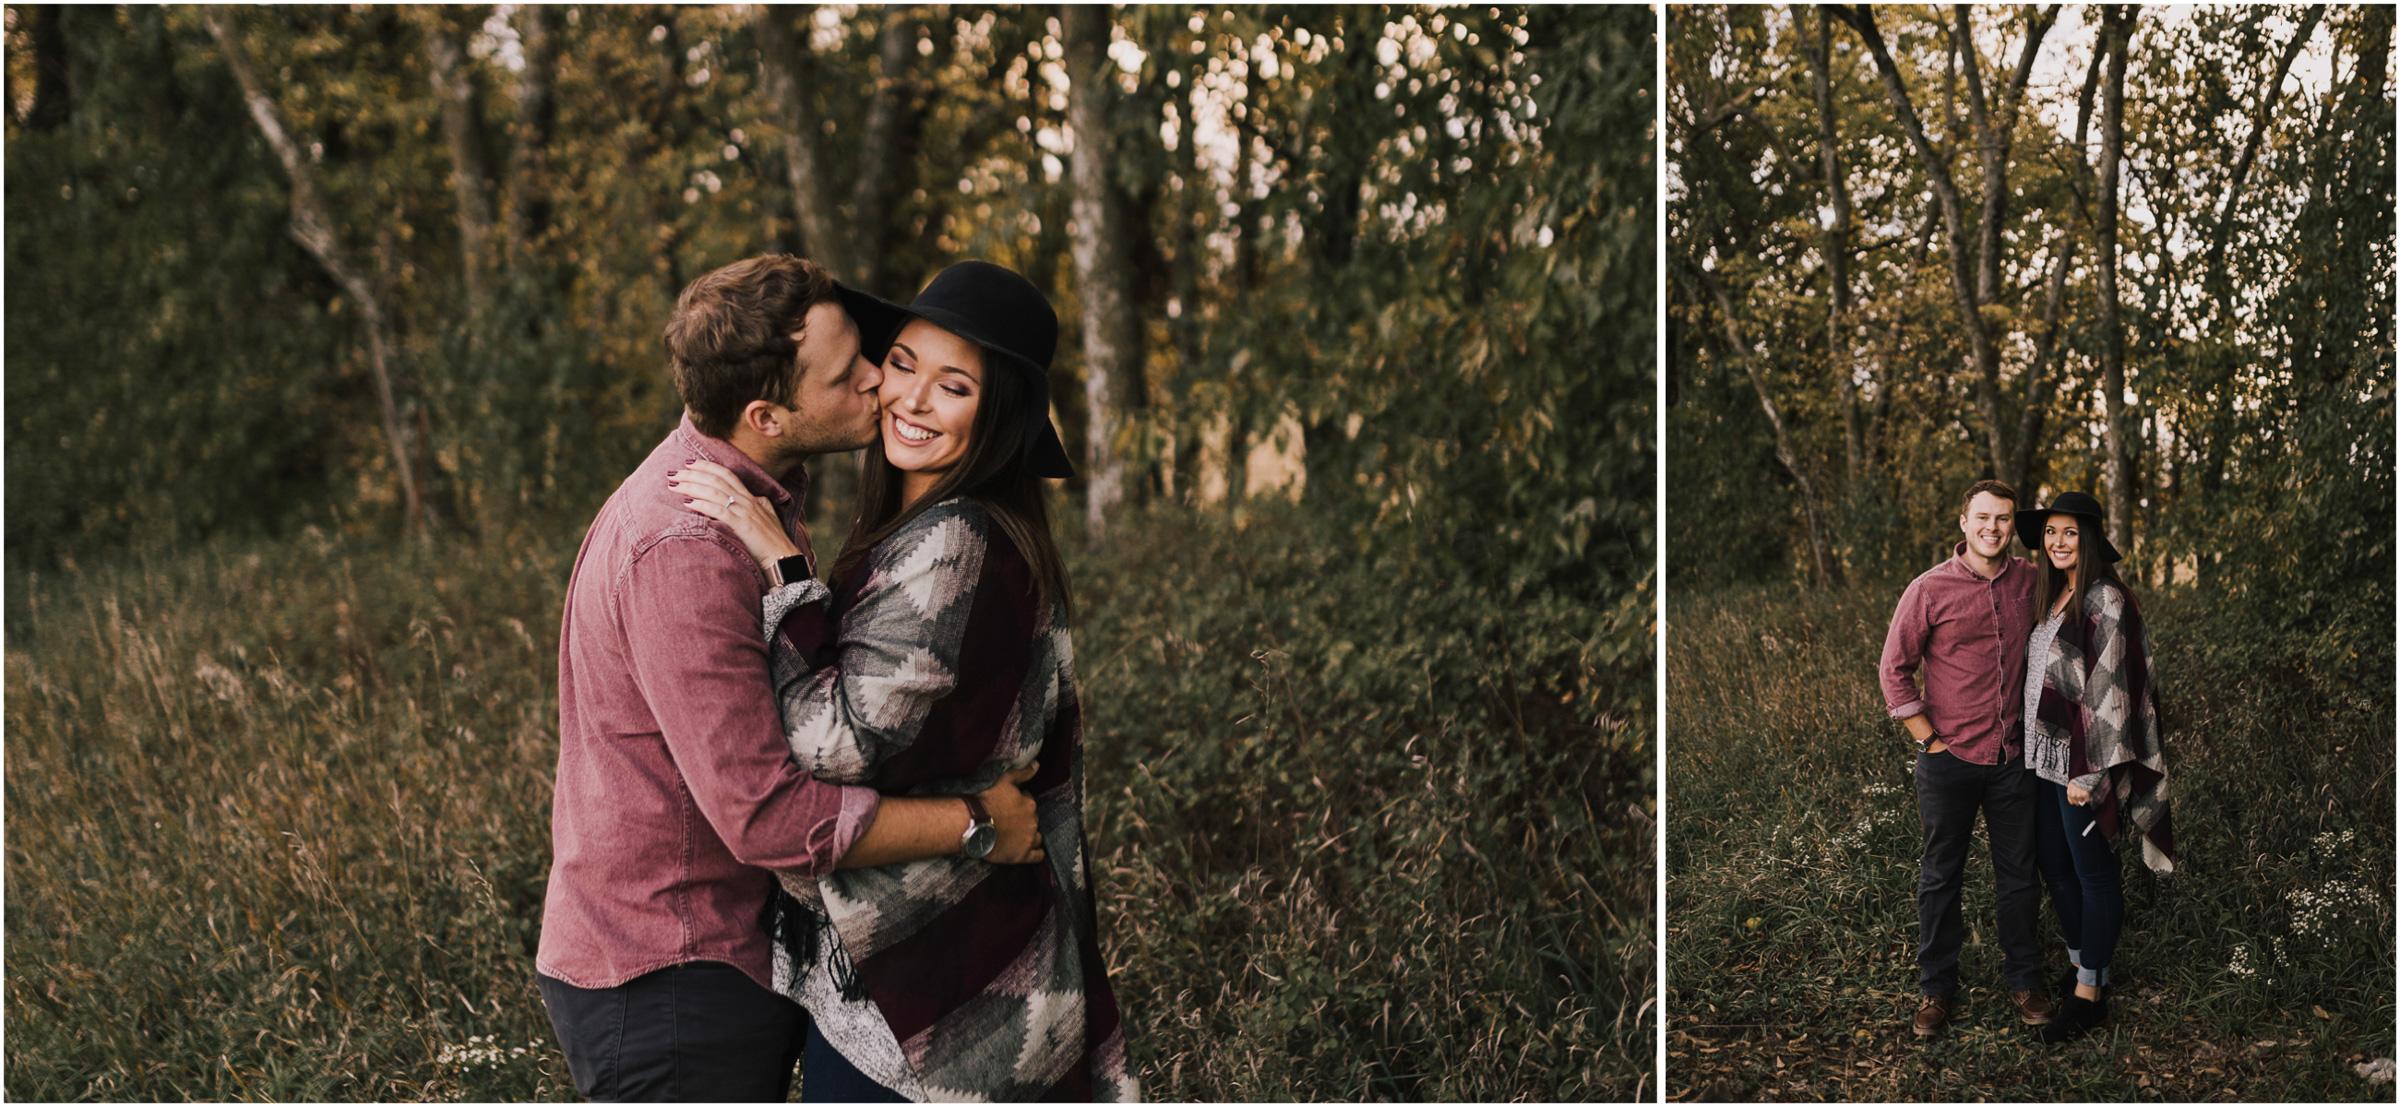 alyssa barletter photography louisburg cider mill fall pumpkins engagement session-6.jpg